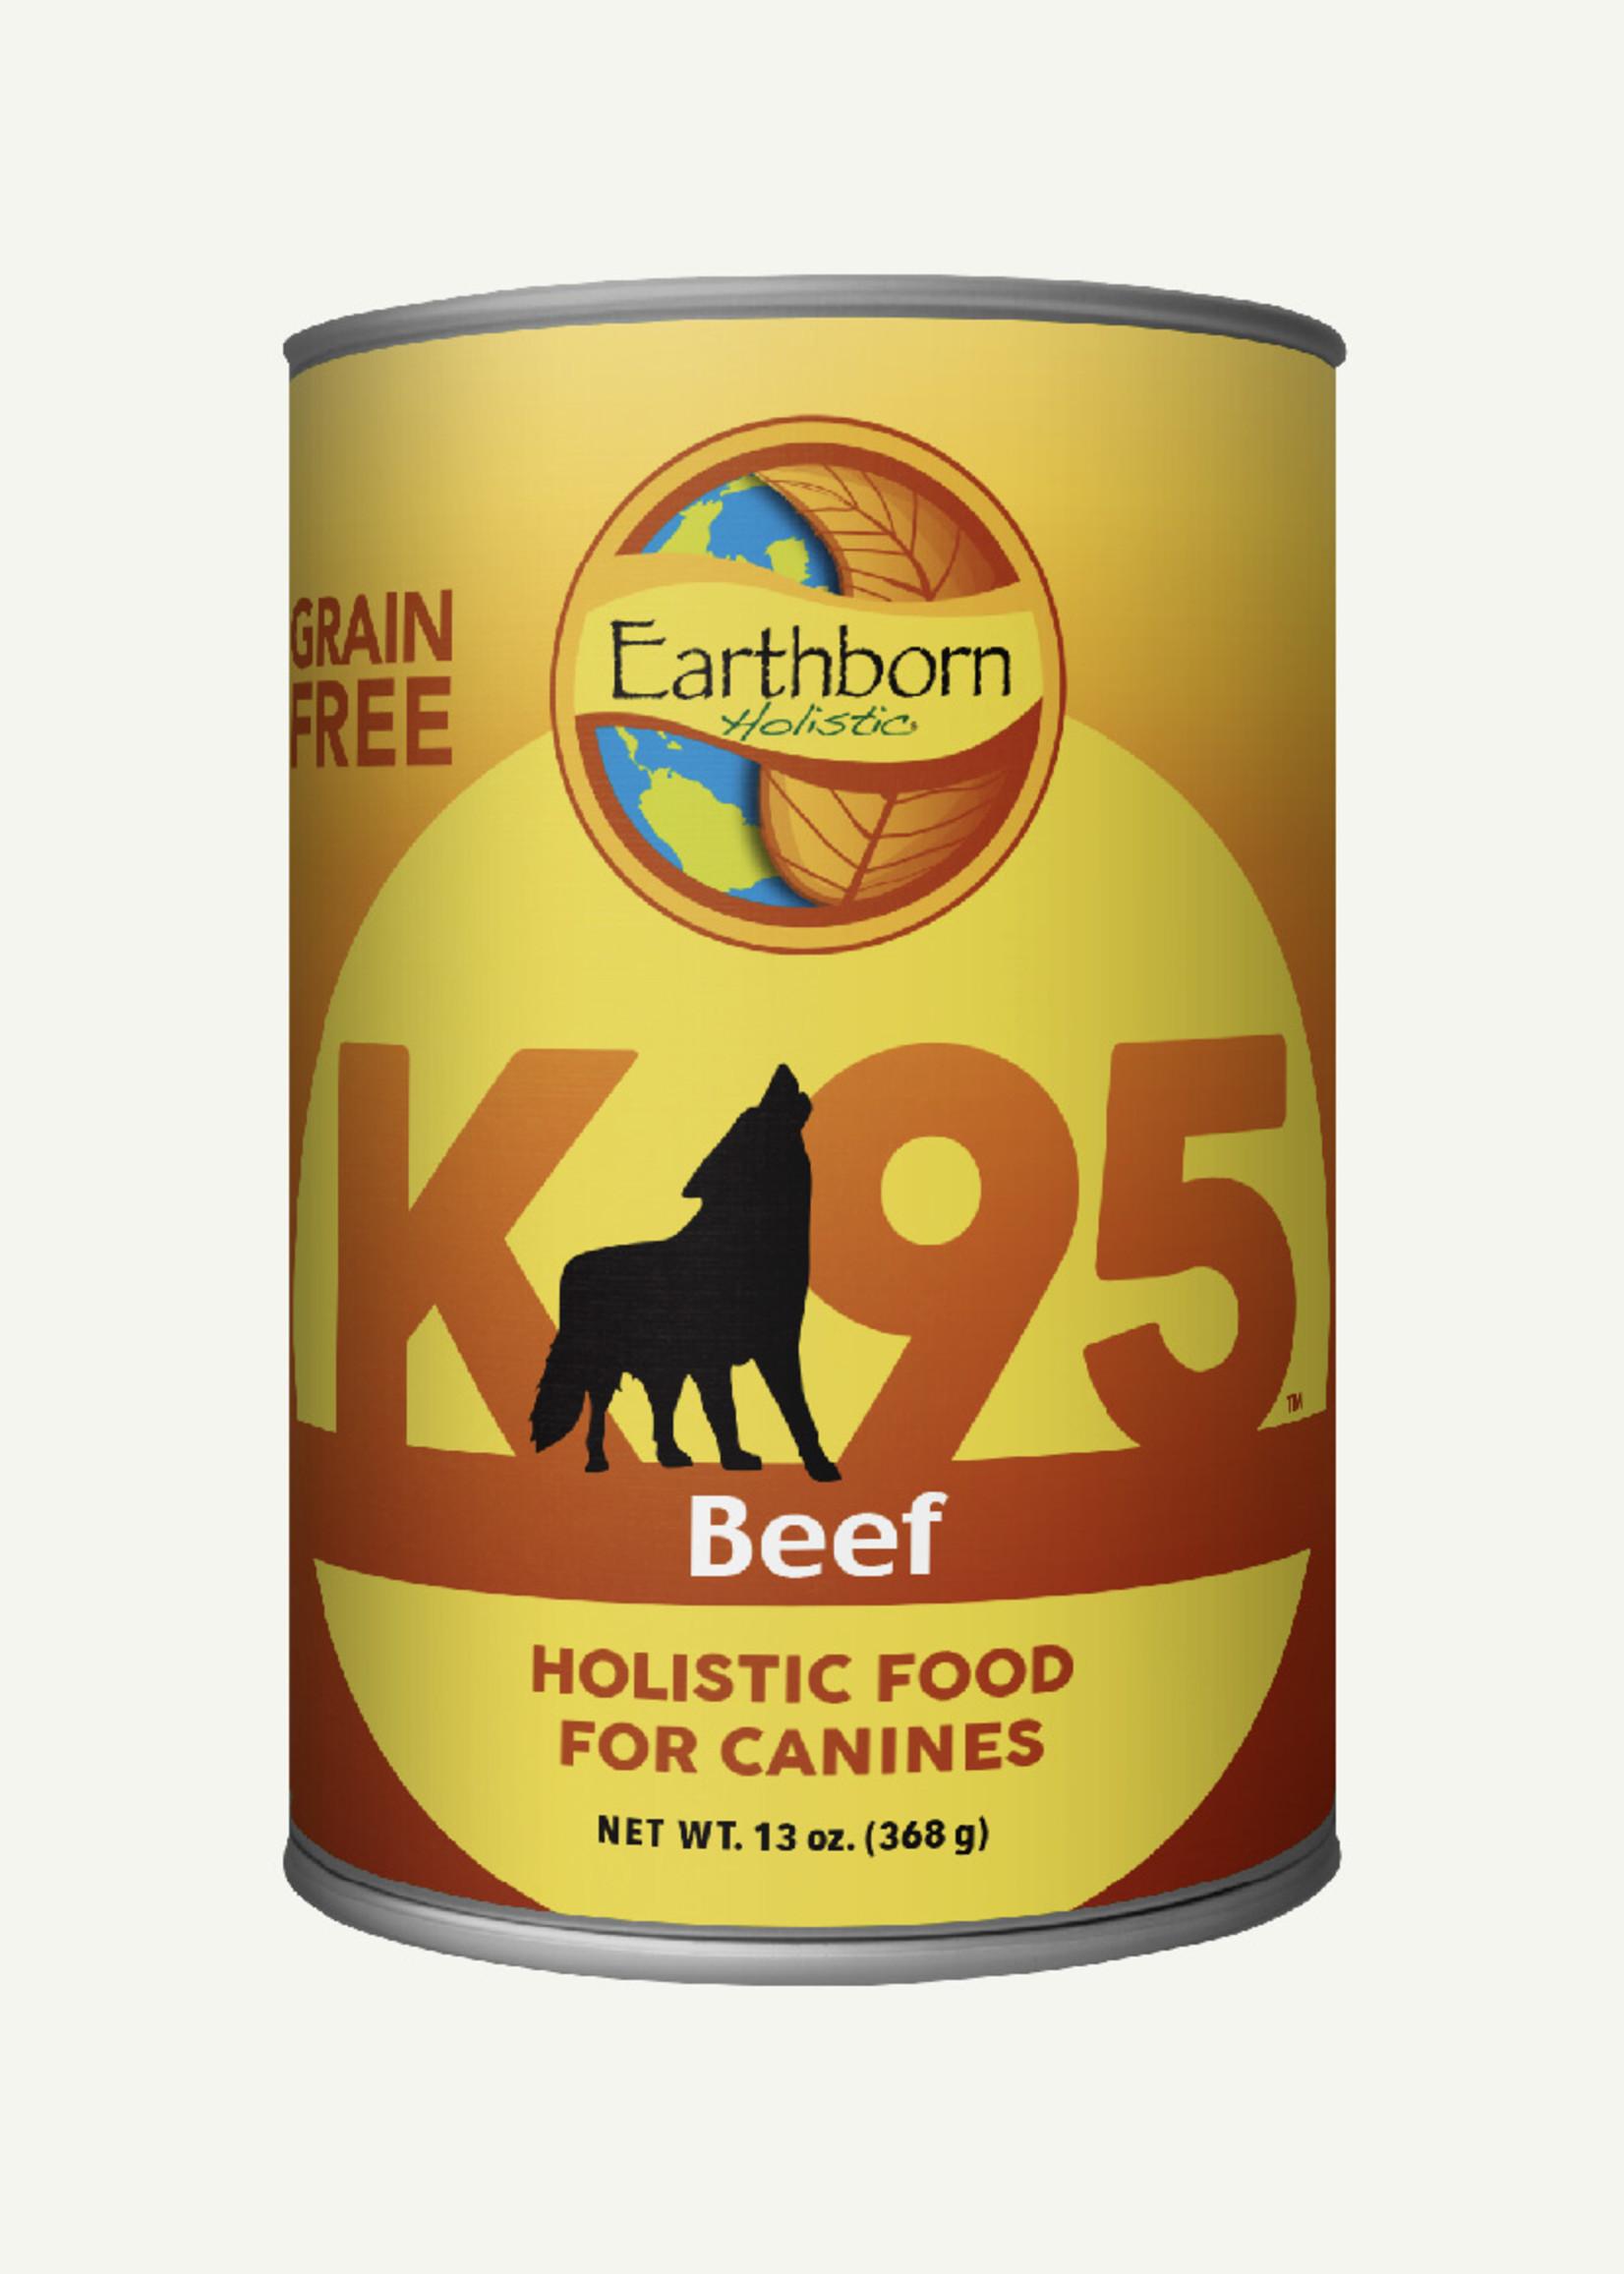 Earthborn Earthborn K95 Beef Grain Free 13 oz Case